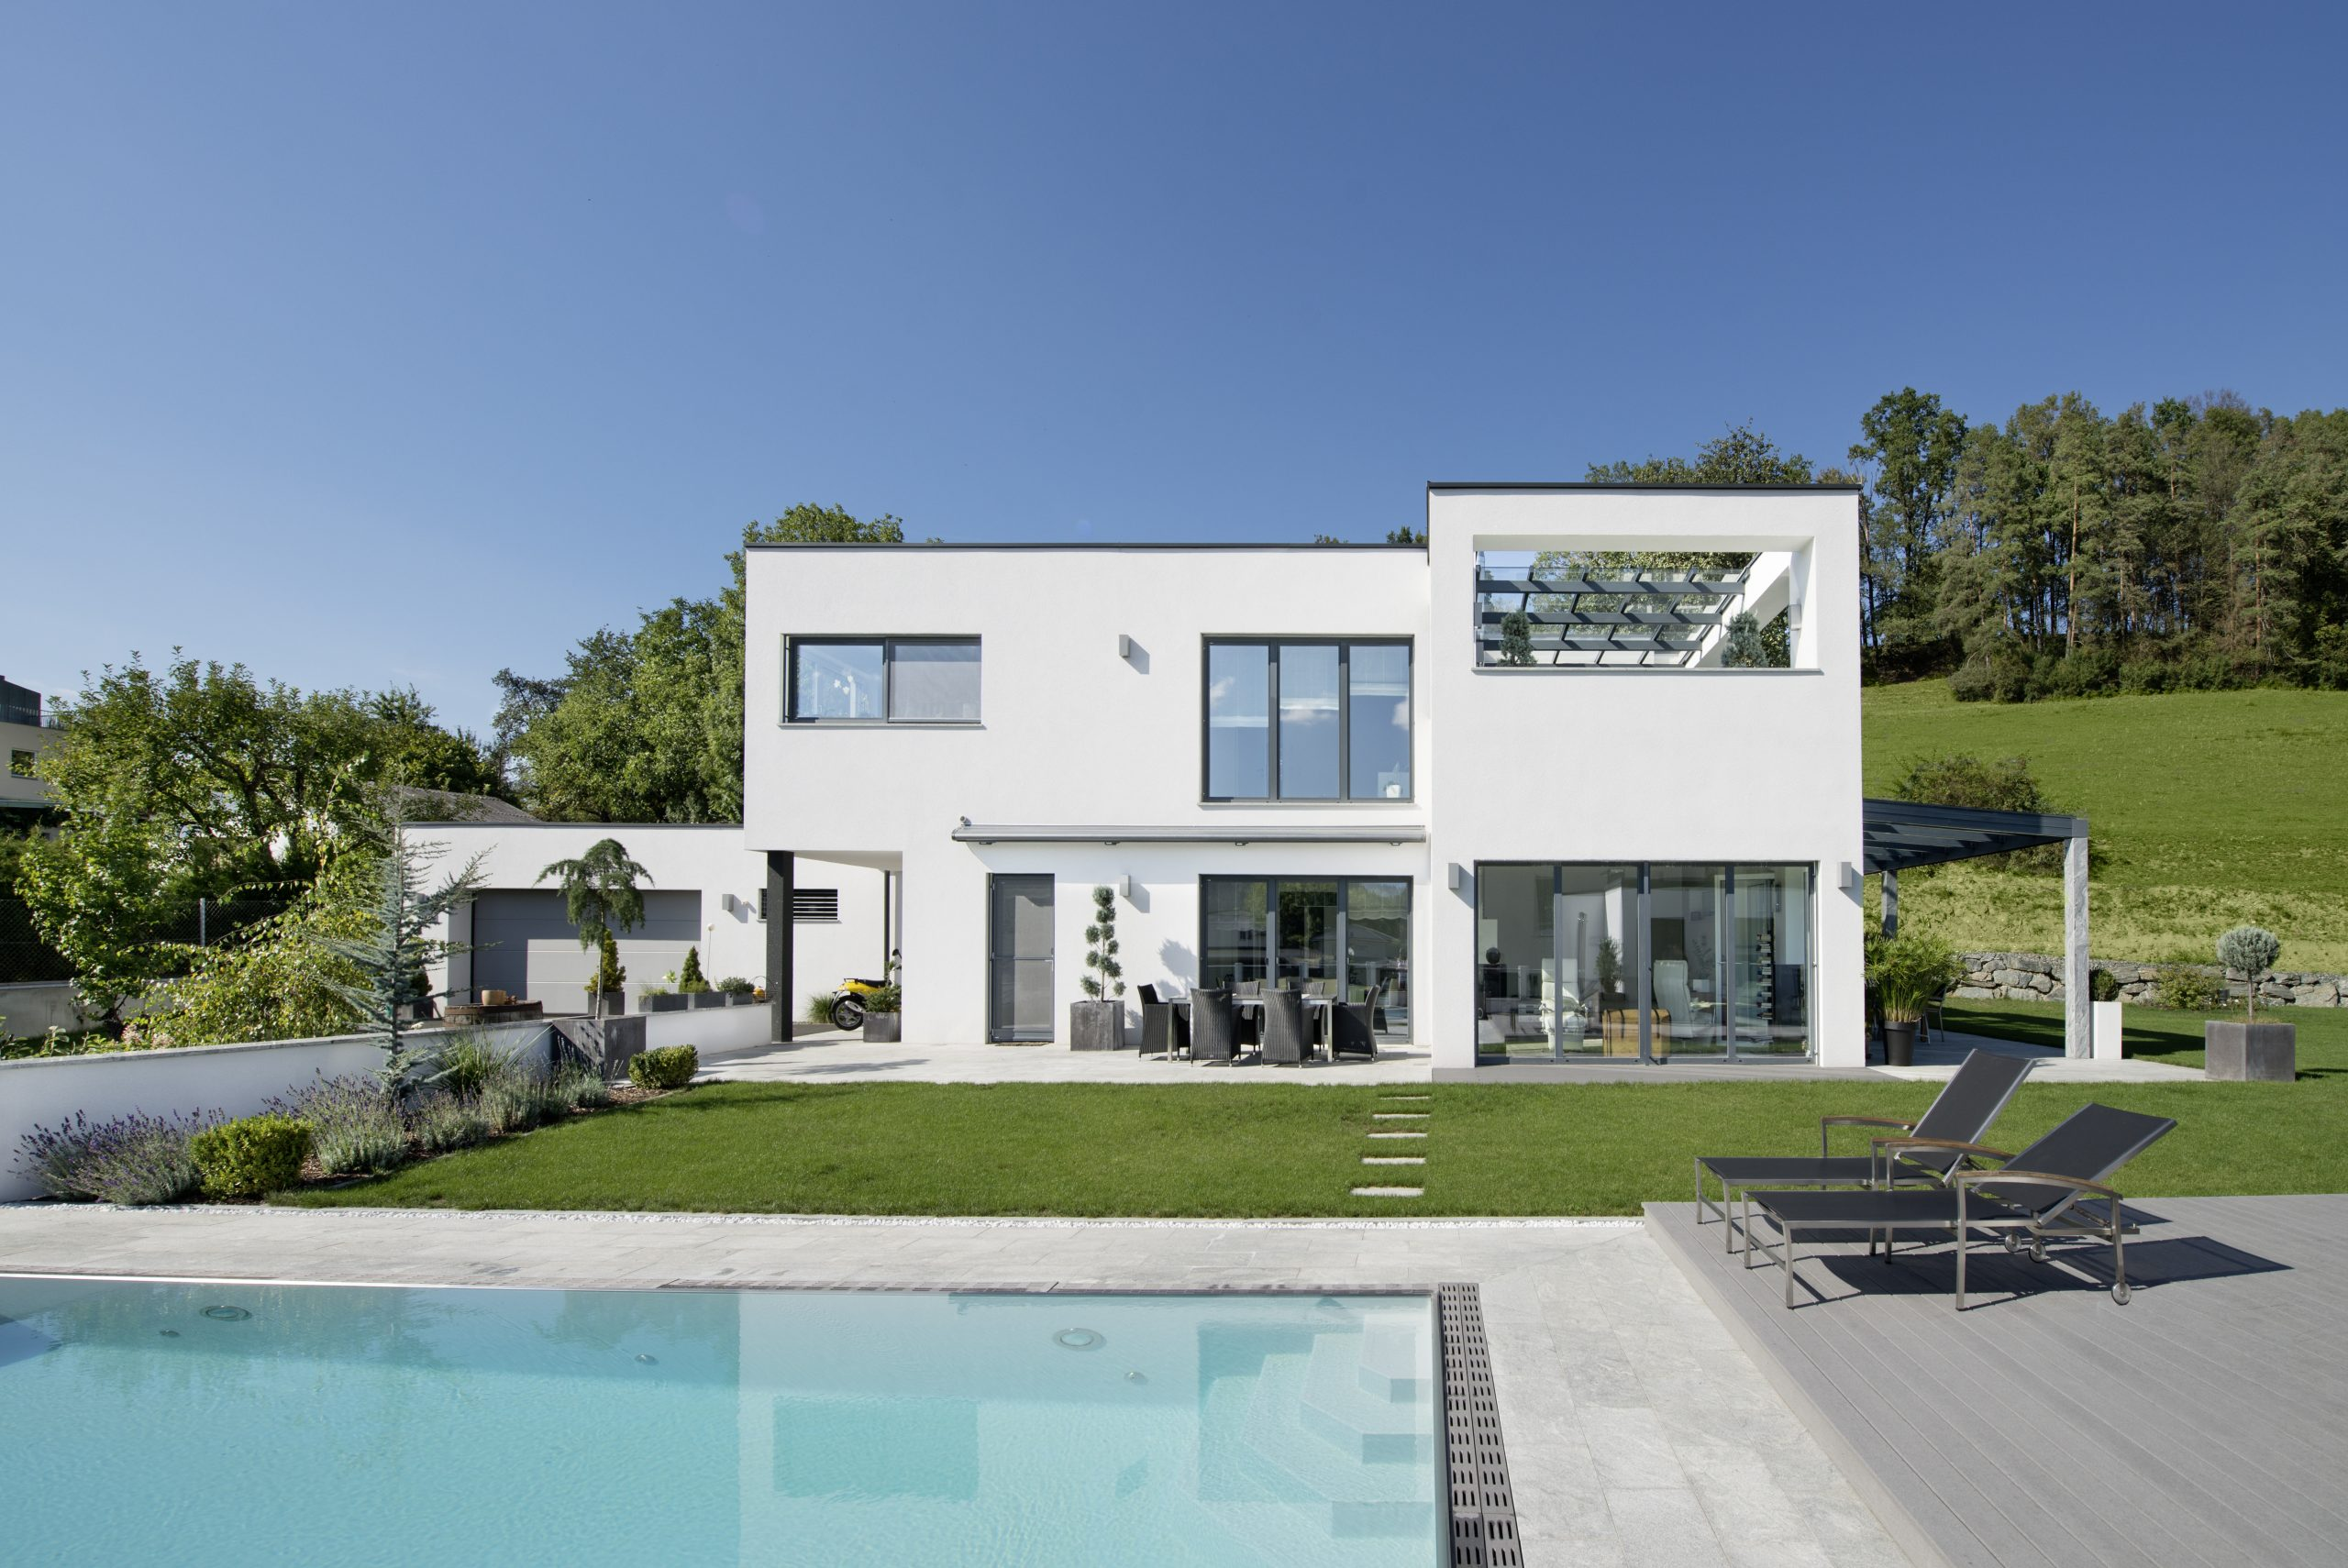 passivhaus windows cost